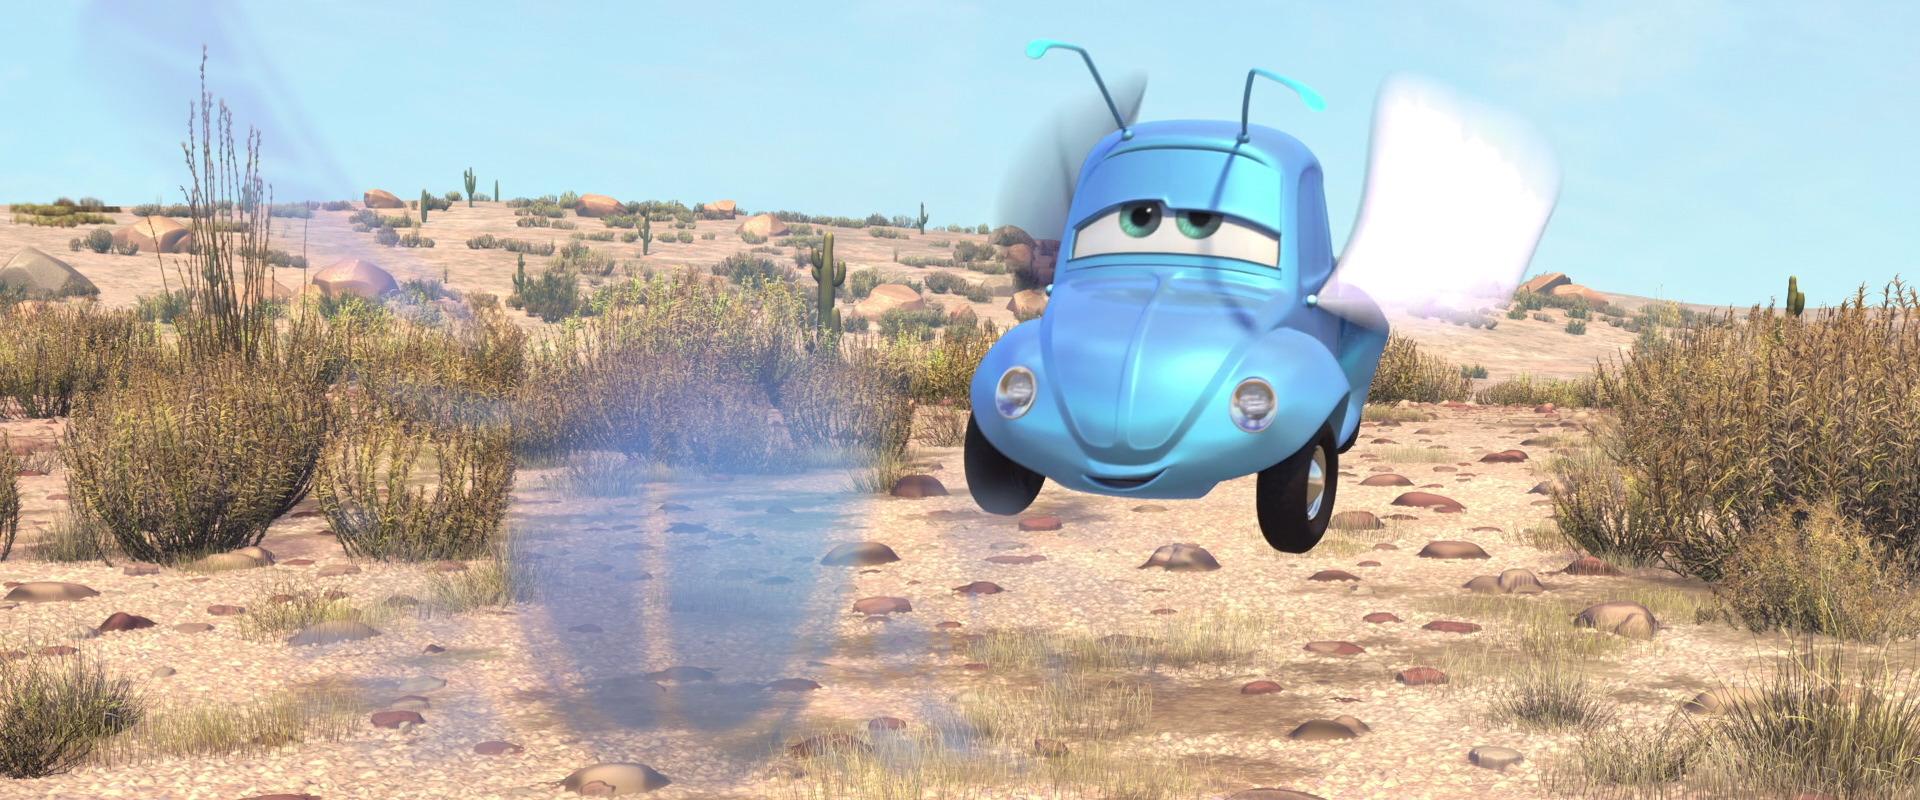 vroomaroundus bugus personnage character pixar disney cars